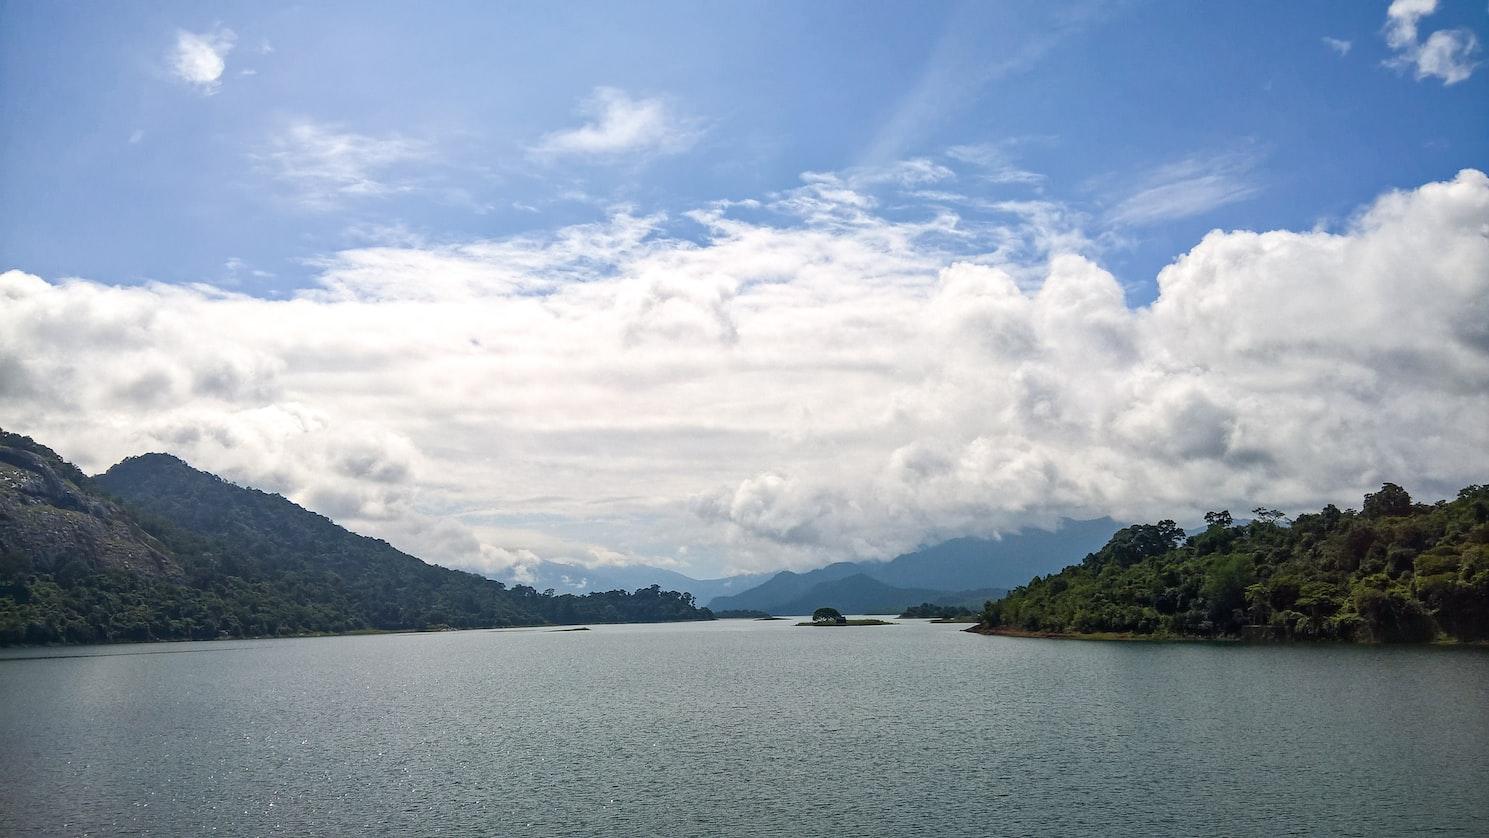 A click in Dharmadam Island